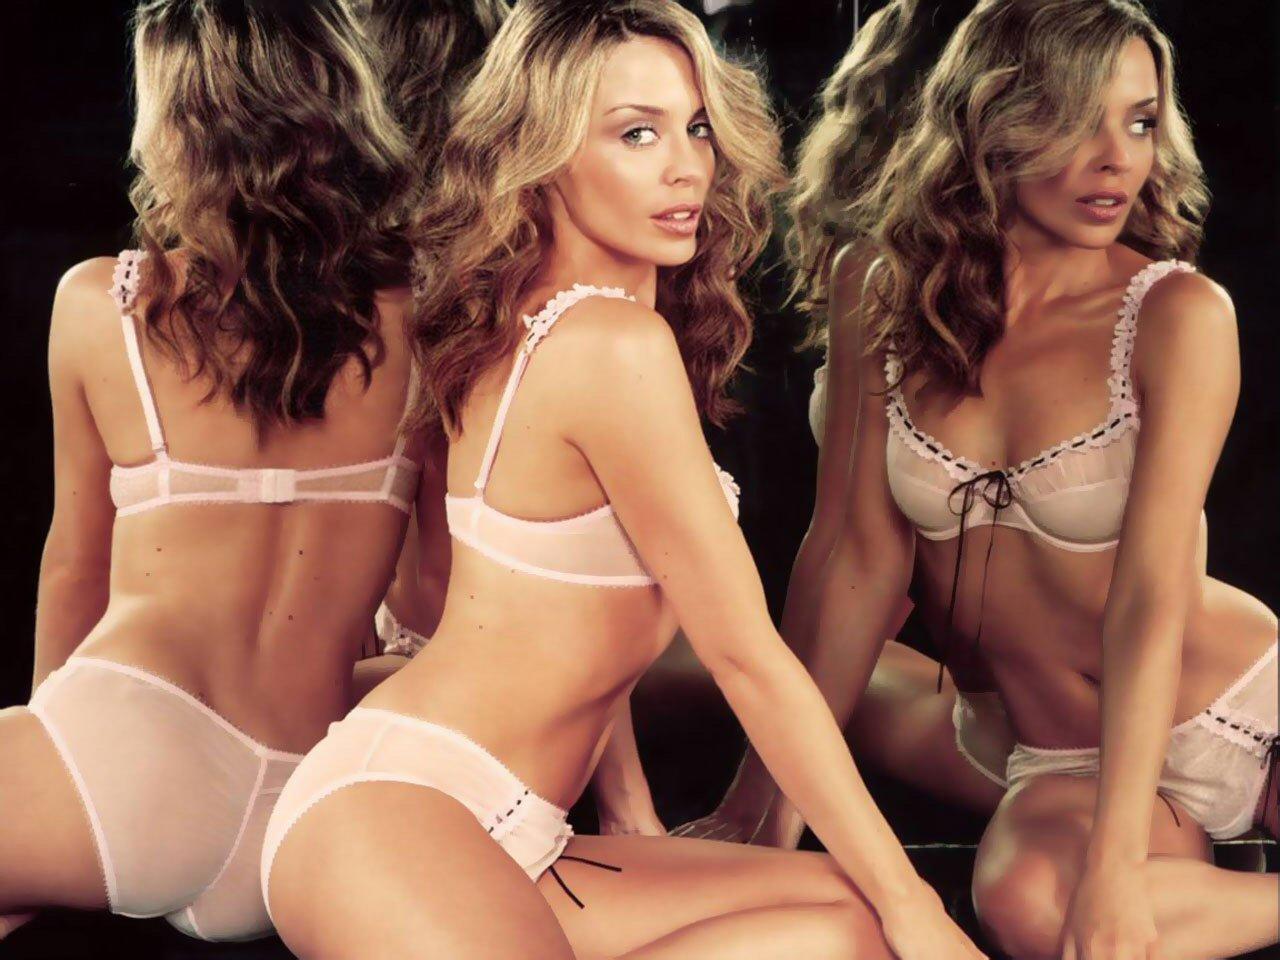 http://4.bp.blogspot.com/-f9hJHDEytlw/T_MlVoZMxRI/AAAAAAAAAHQ/YibGsc7buLU/s1600/Sexy-Lingerie..jpg